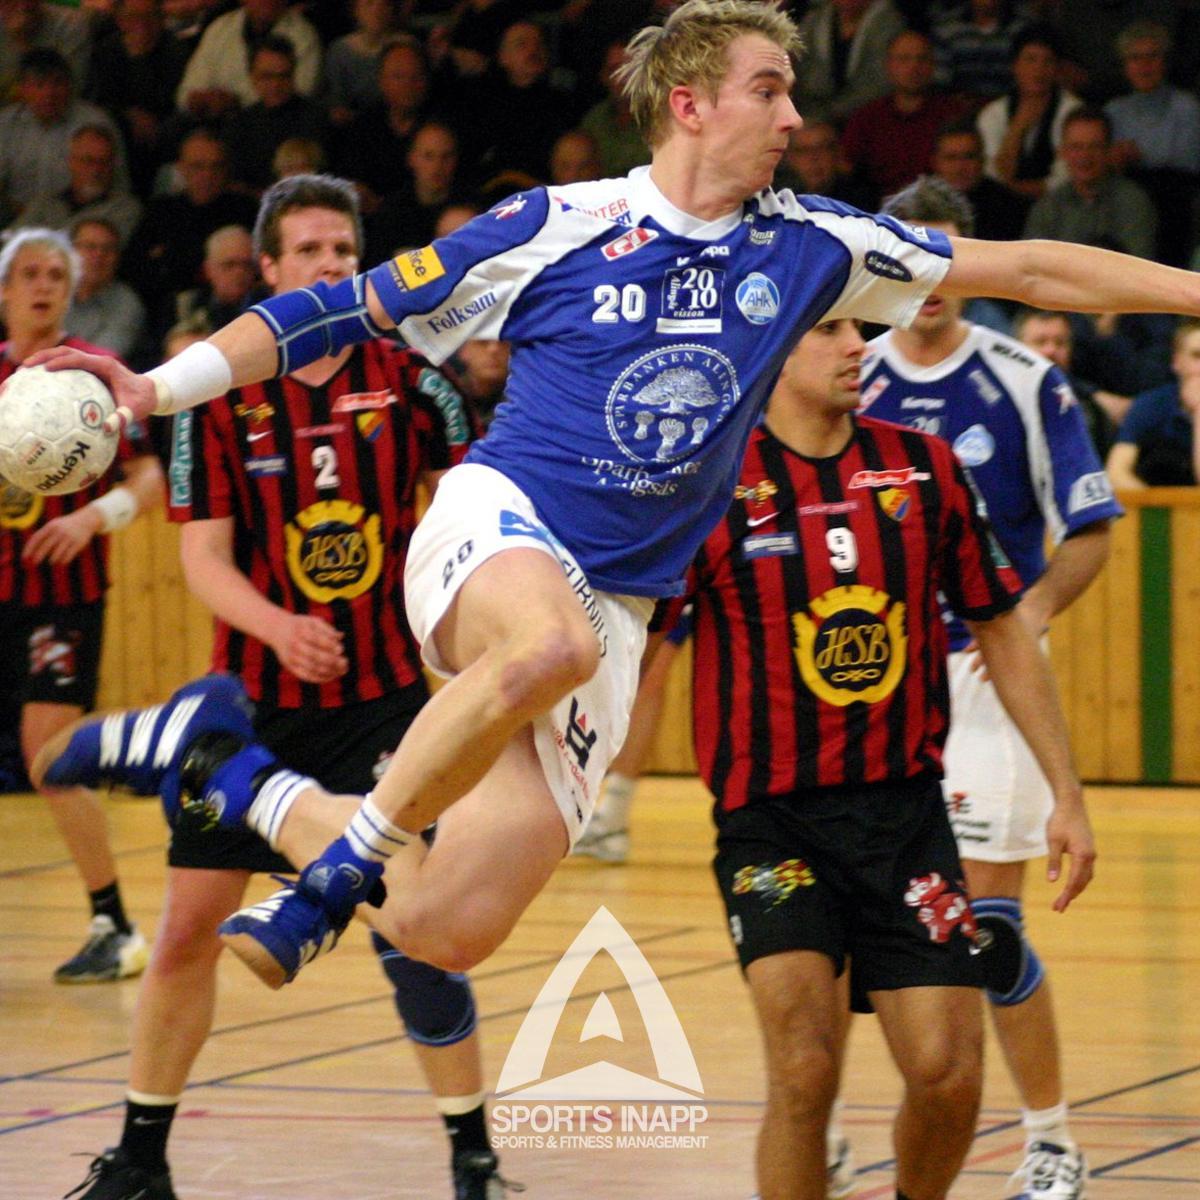 Sports In APP - Andebol